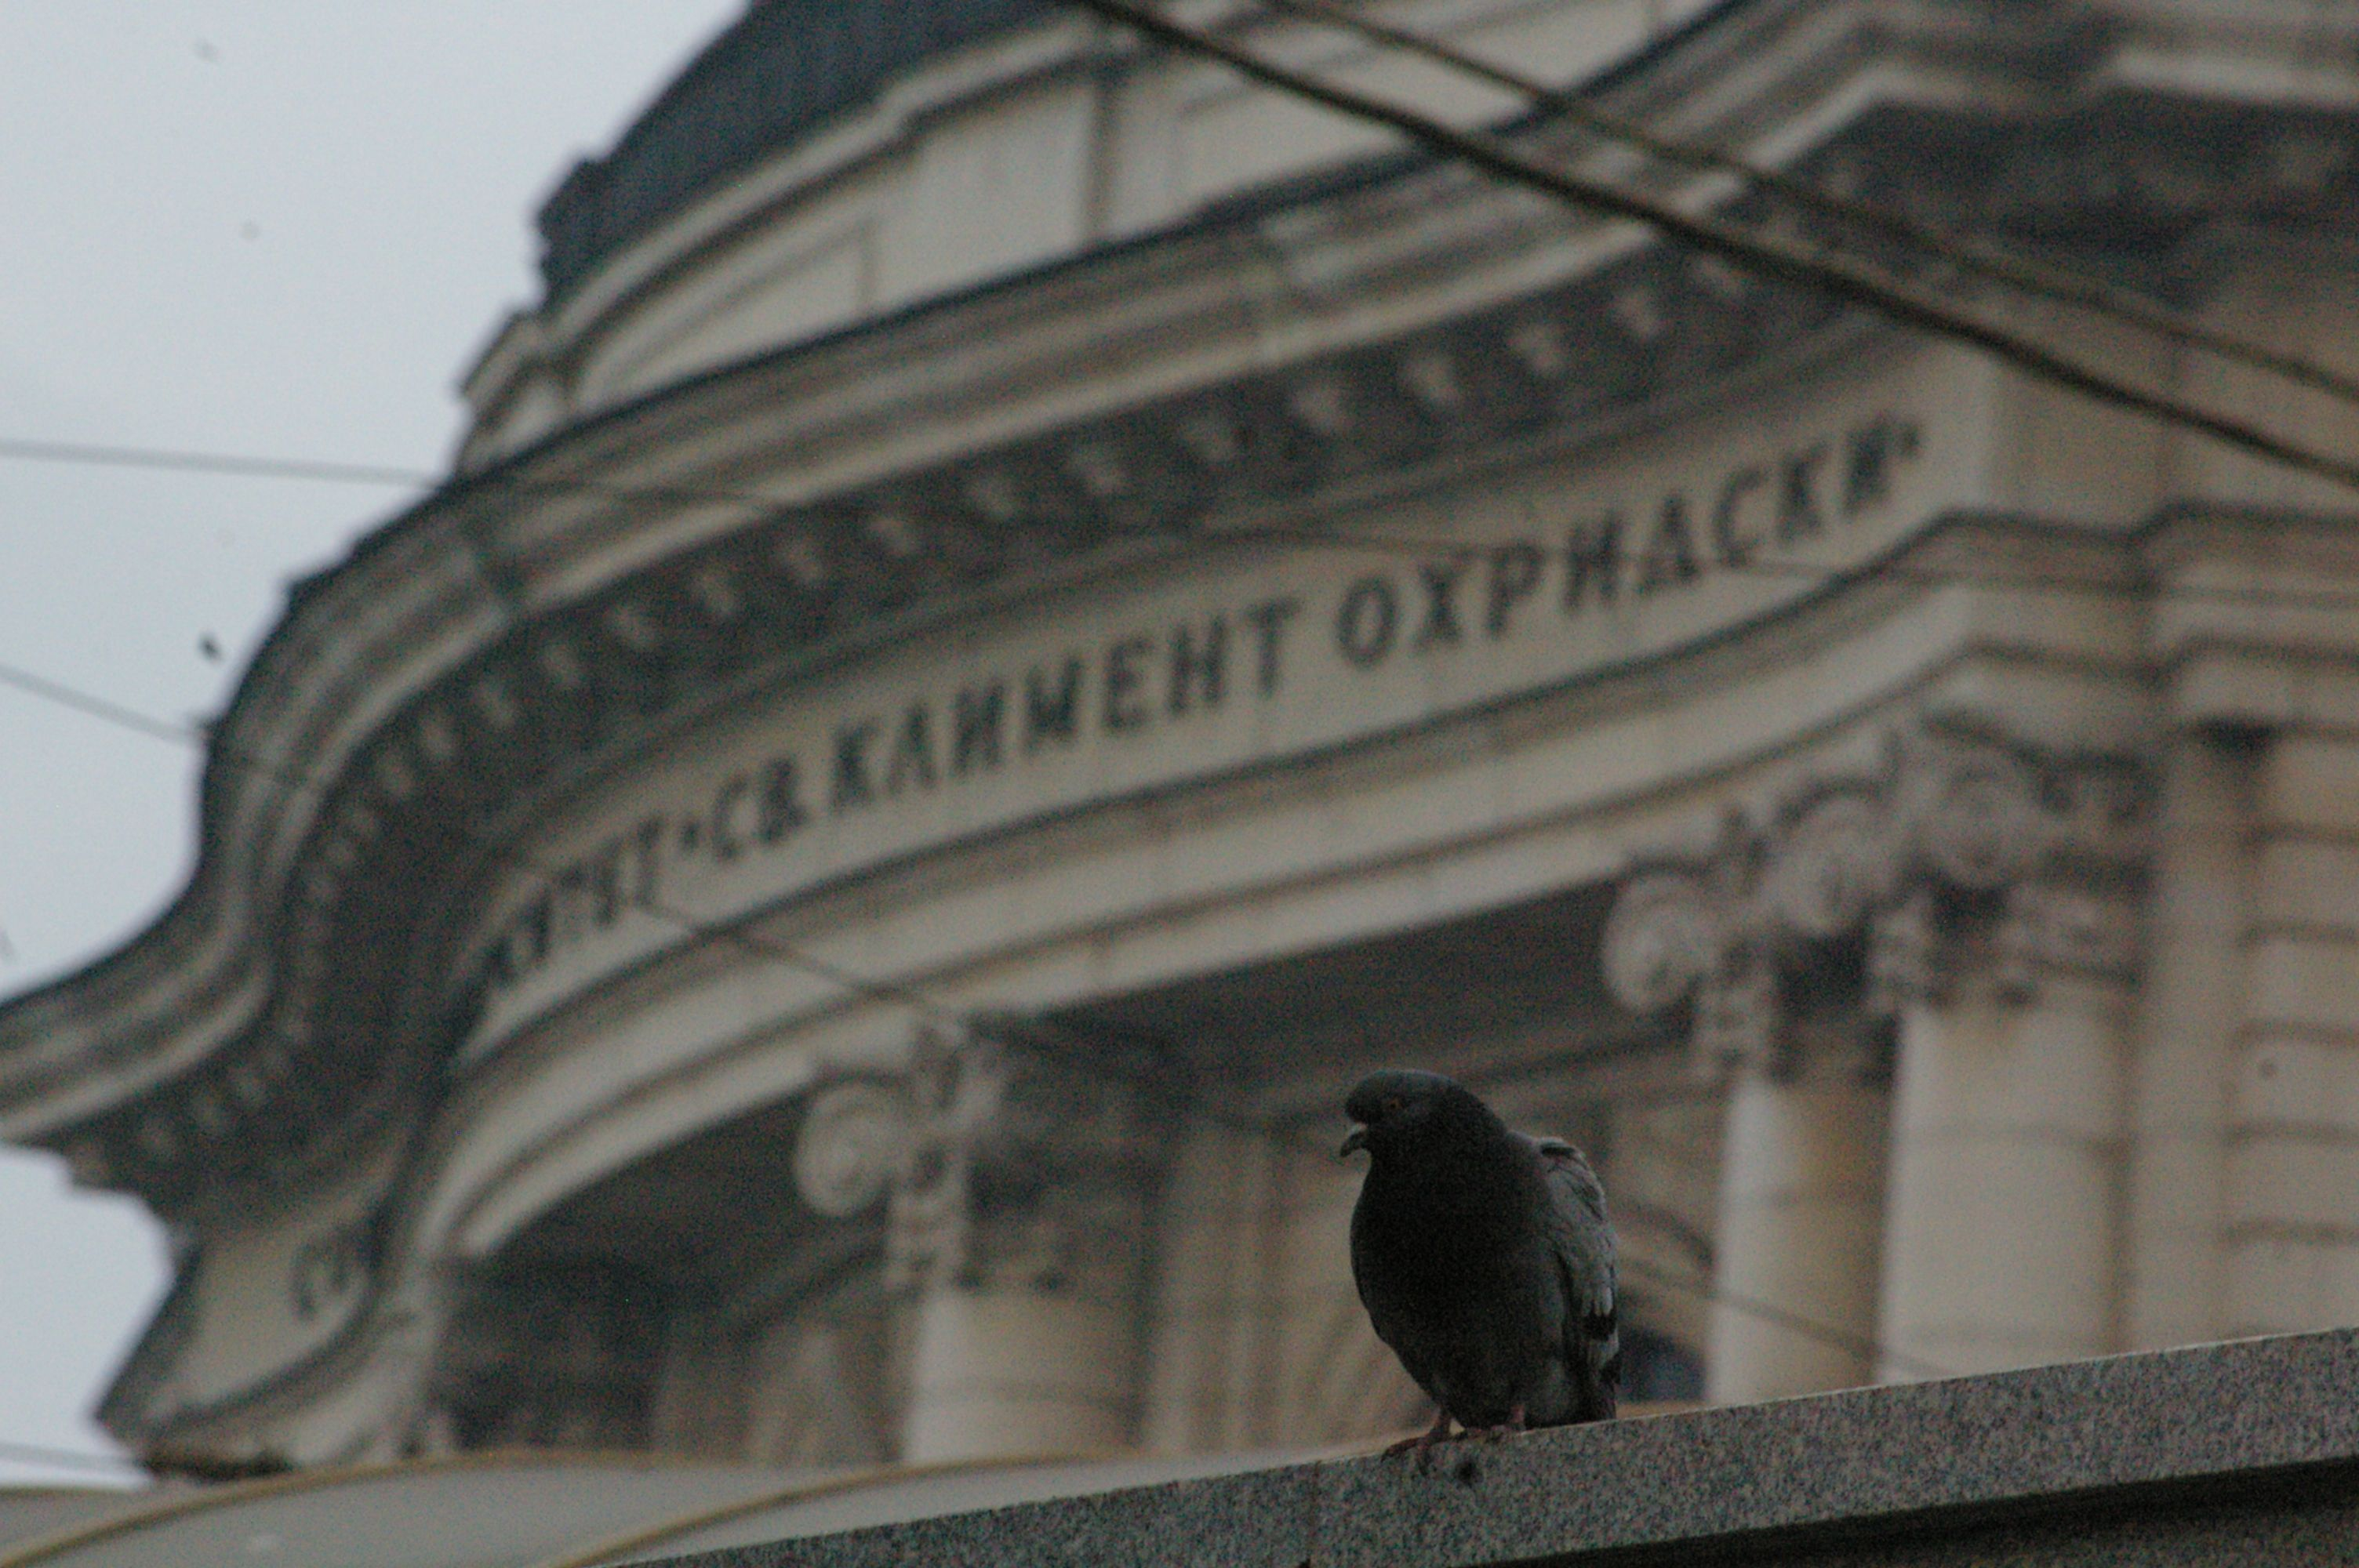 снимка - Юлиан Собаджиев